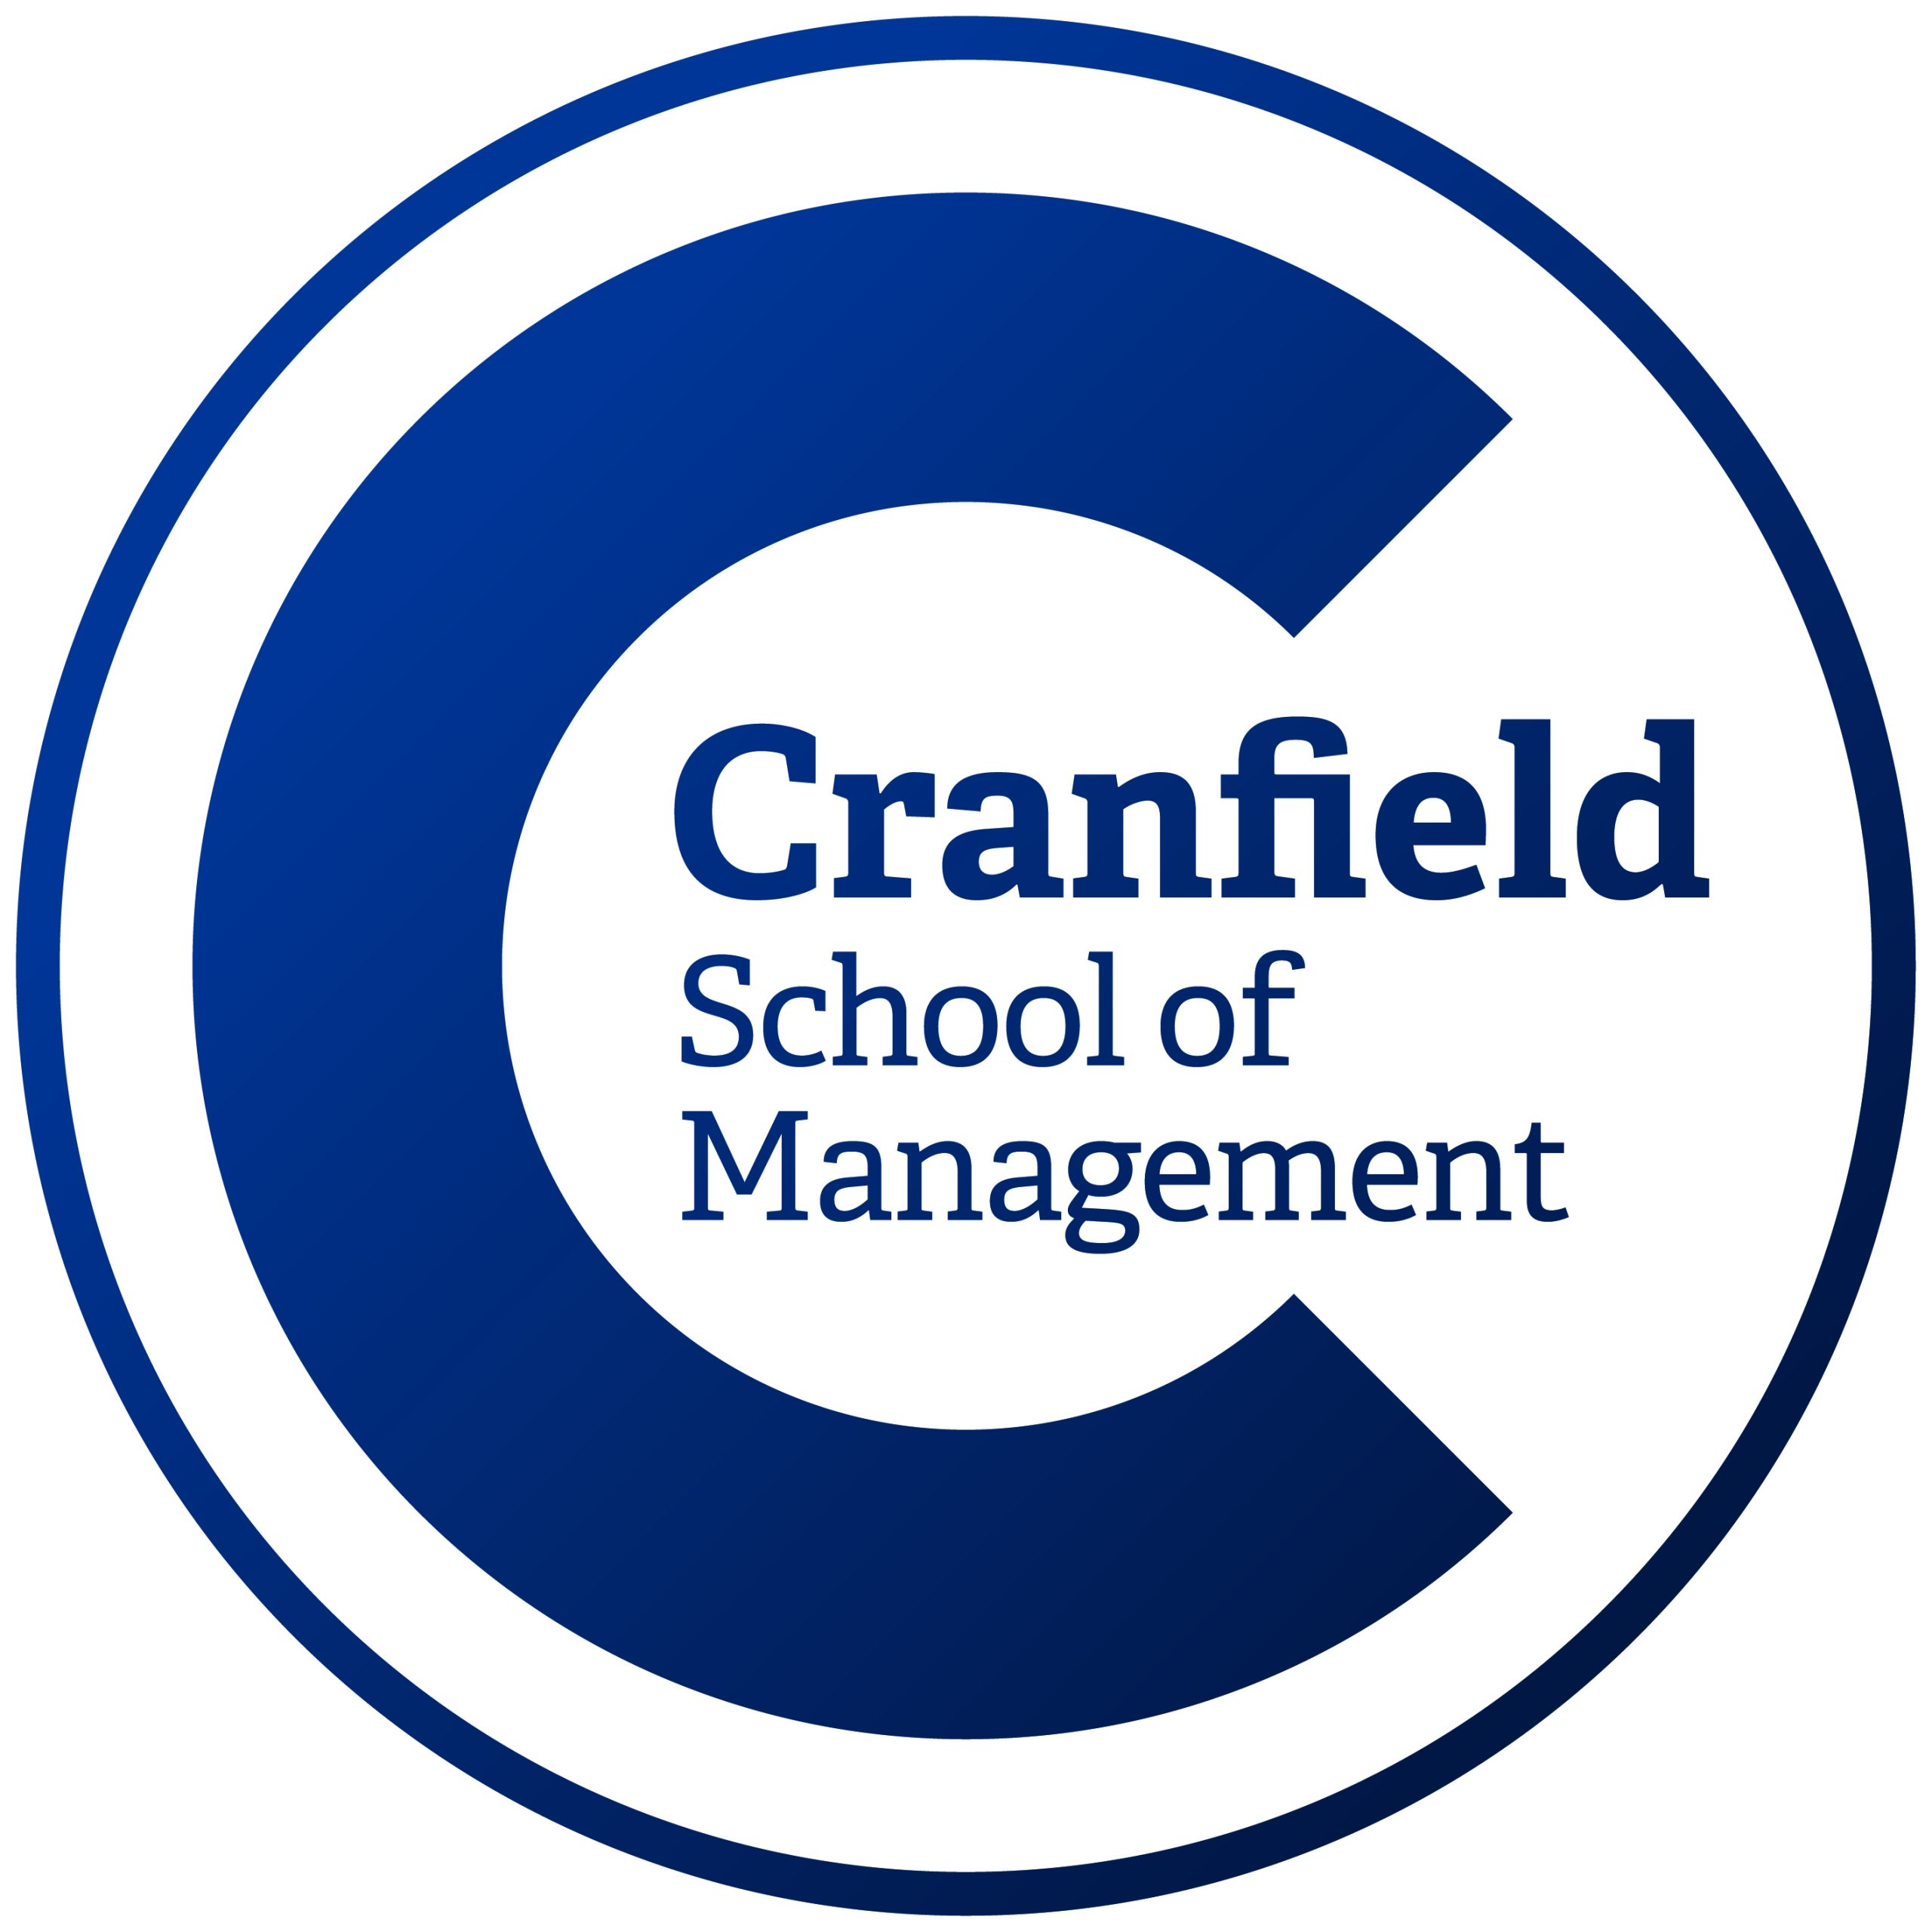 cranfield2